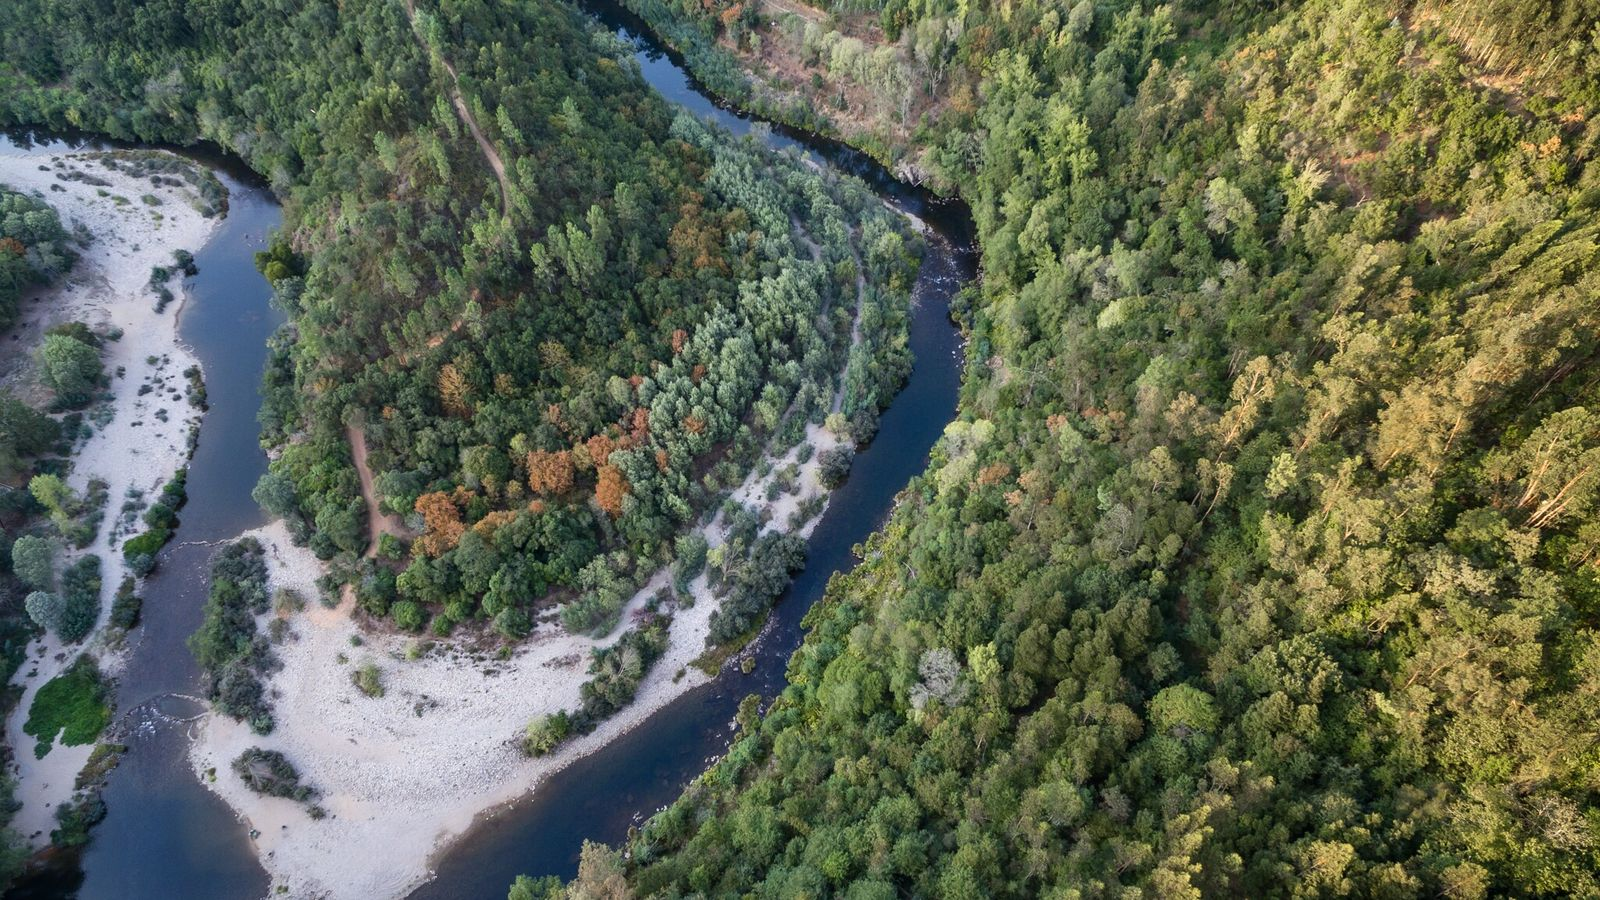 Vista aérea sobre o percurso ondulante do magnífico rio Paiva na zona de Cinfães.